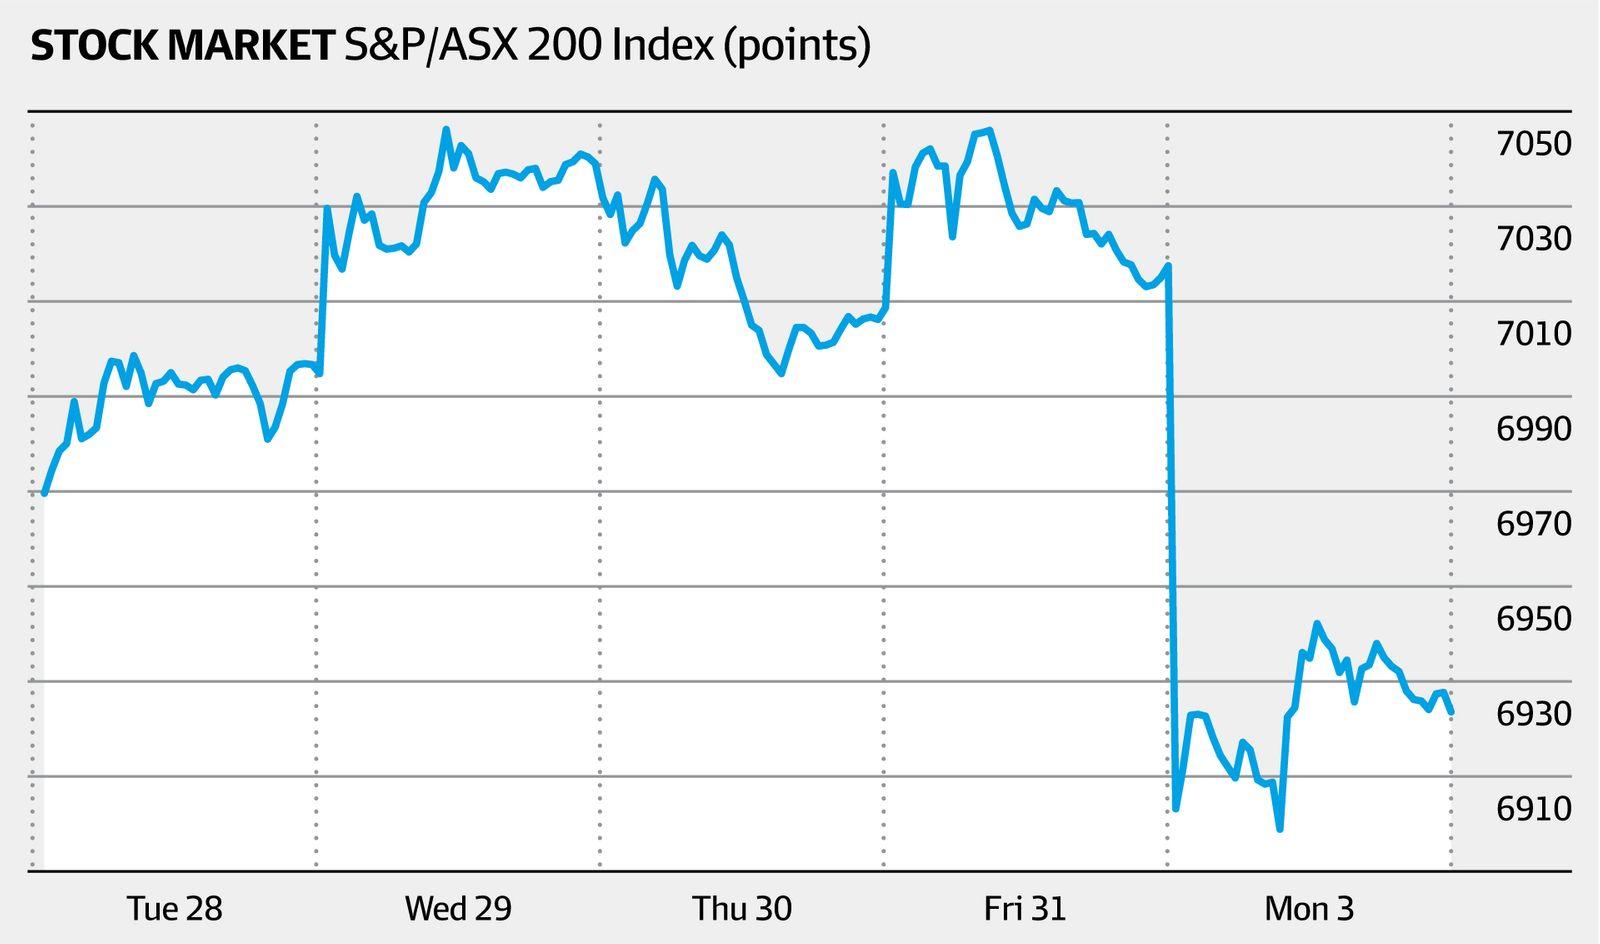 Stock market S&P/ASX 200 (XJO) index, past five days (AFR)